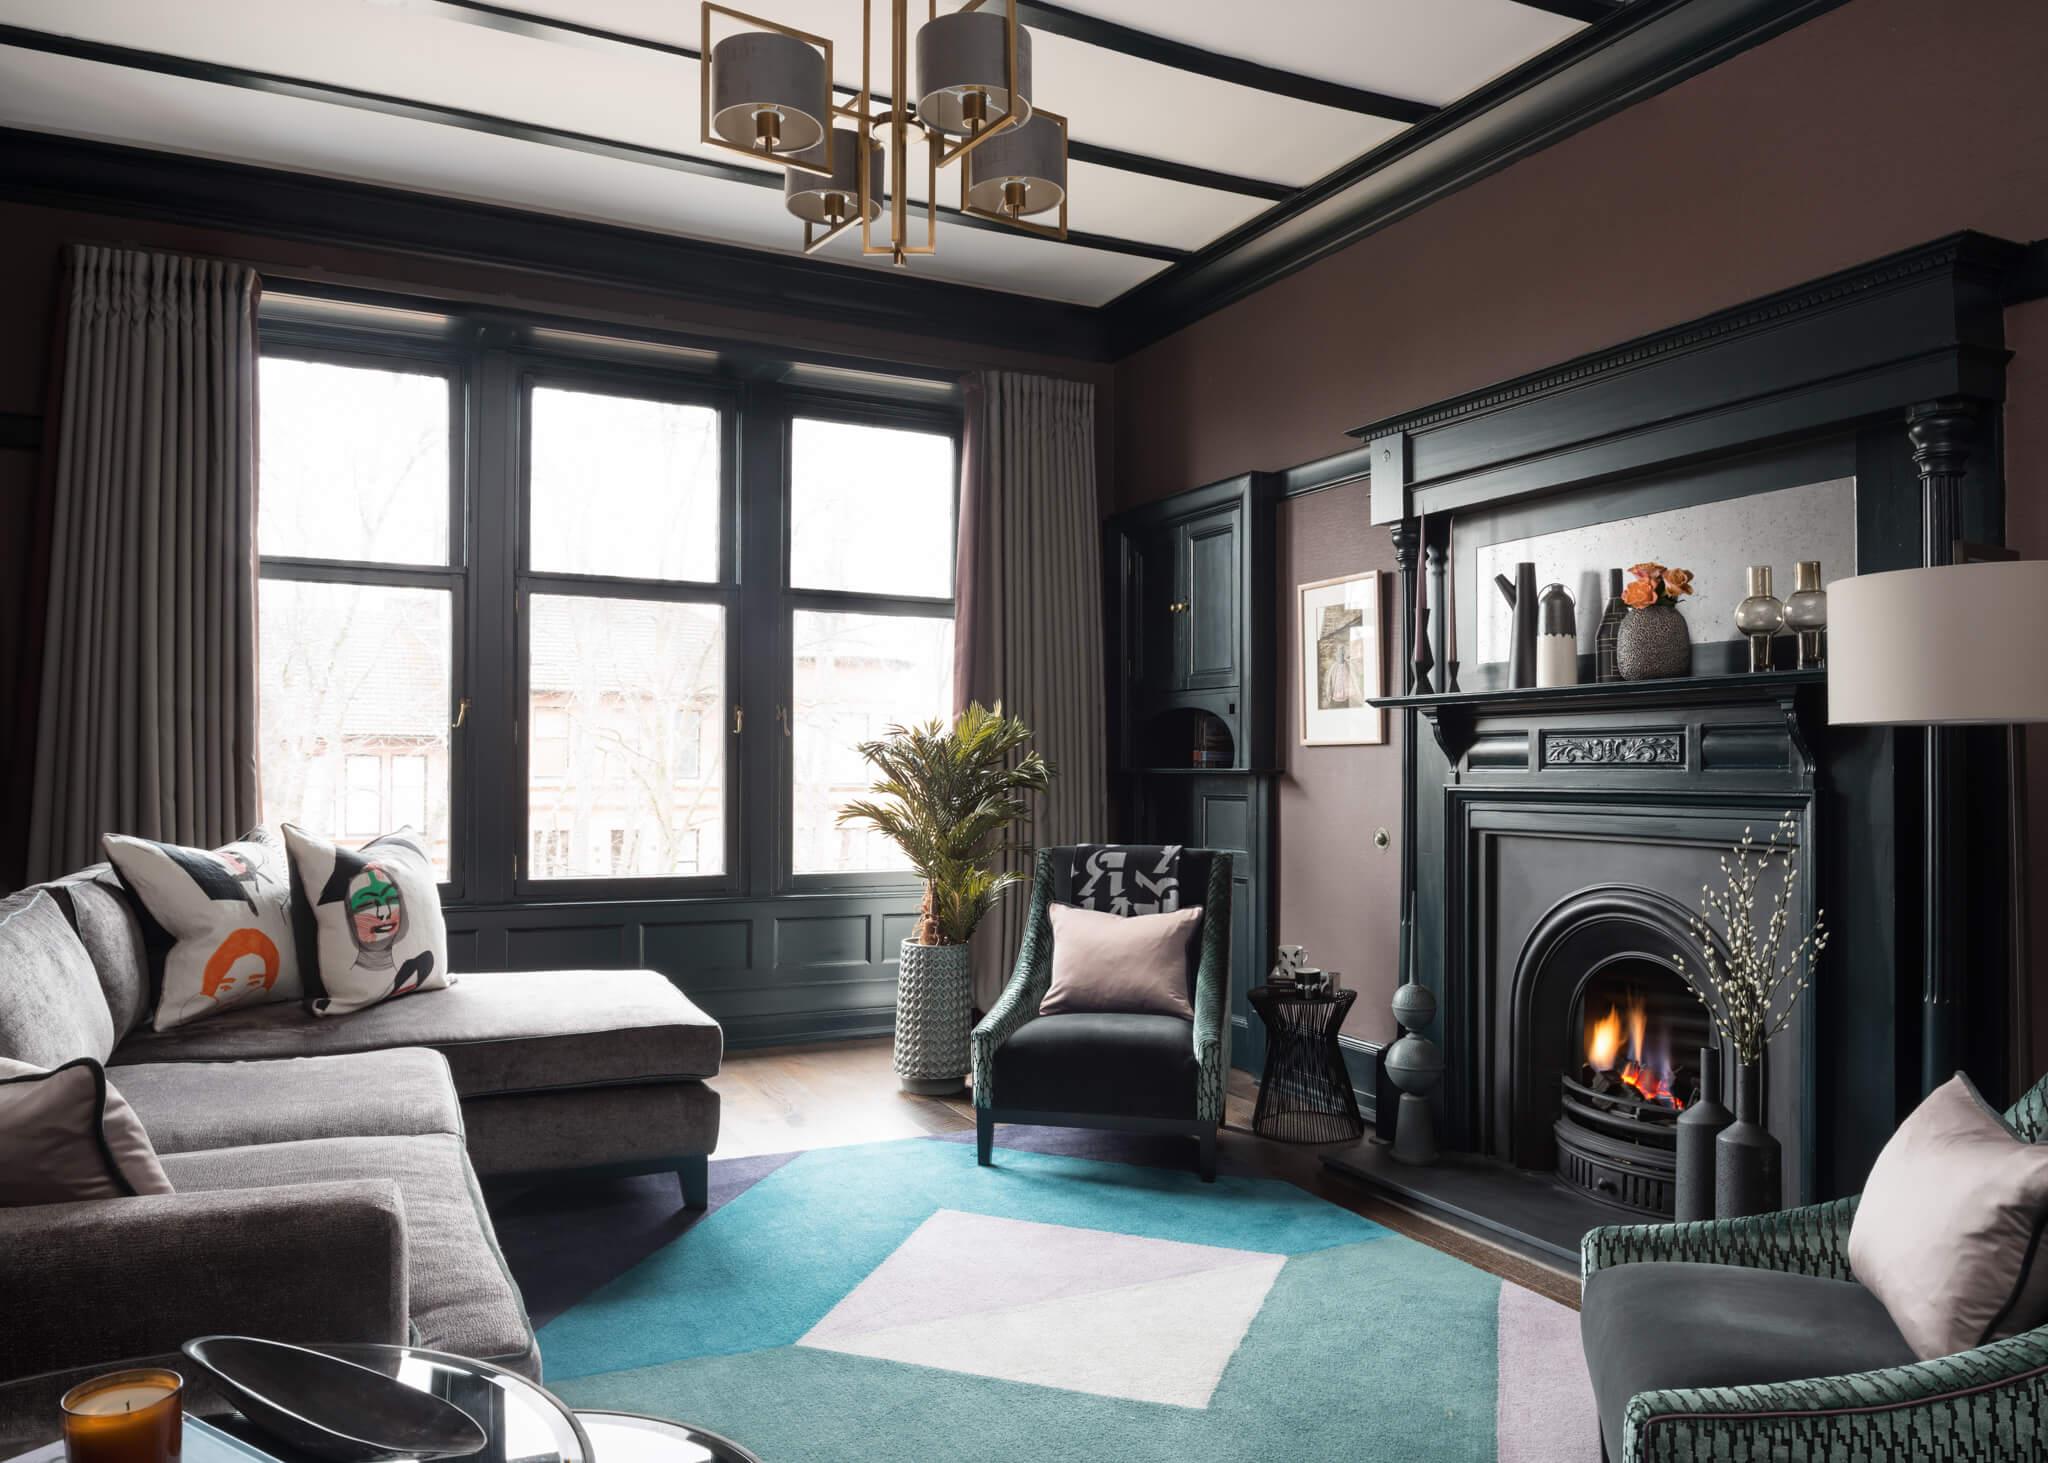 Print-Livingroom-Overview-Chelsea-Mclaine-Interiors-Introductory-Shoot-©ZACandZAC-2